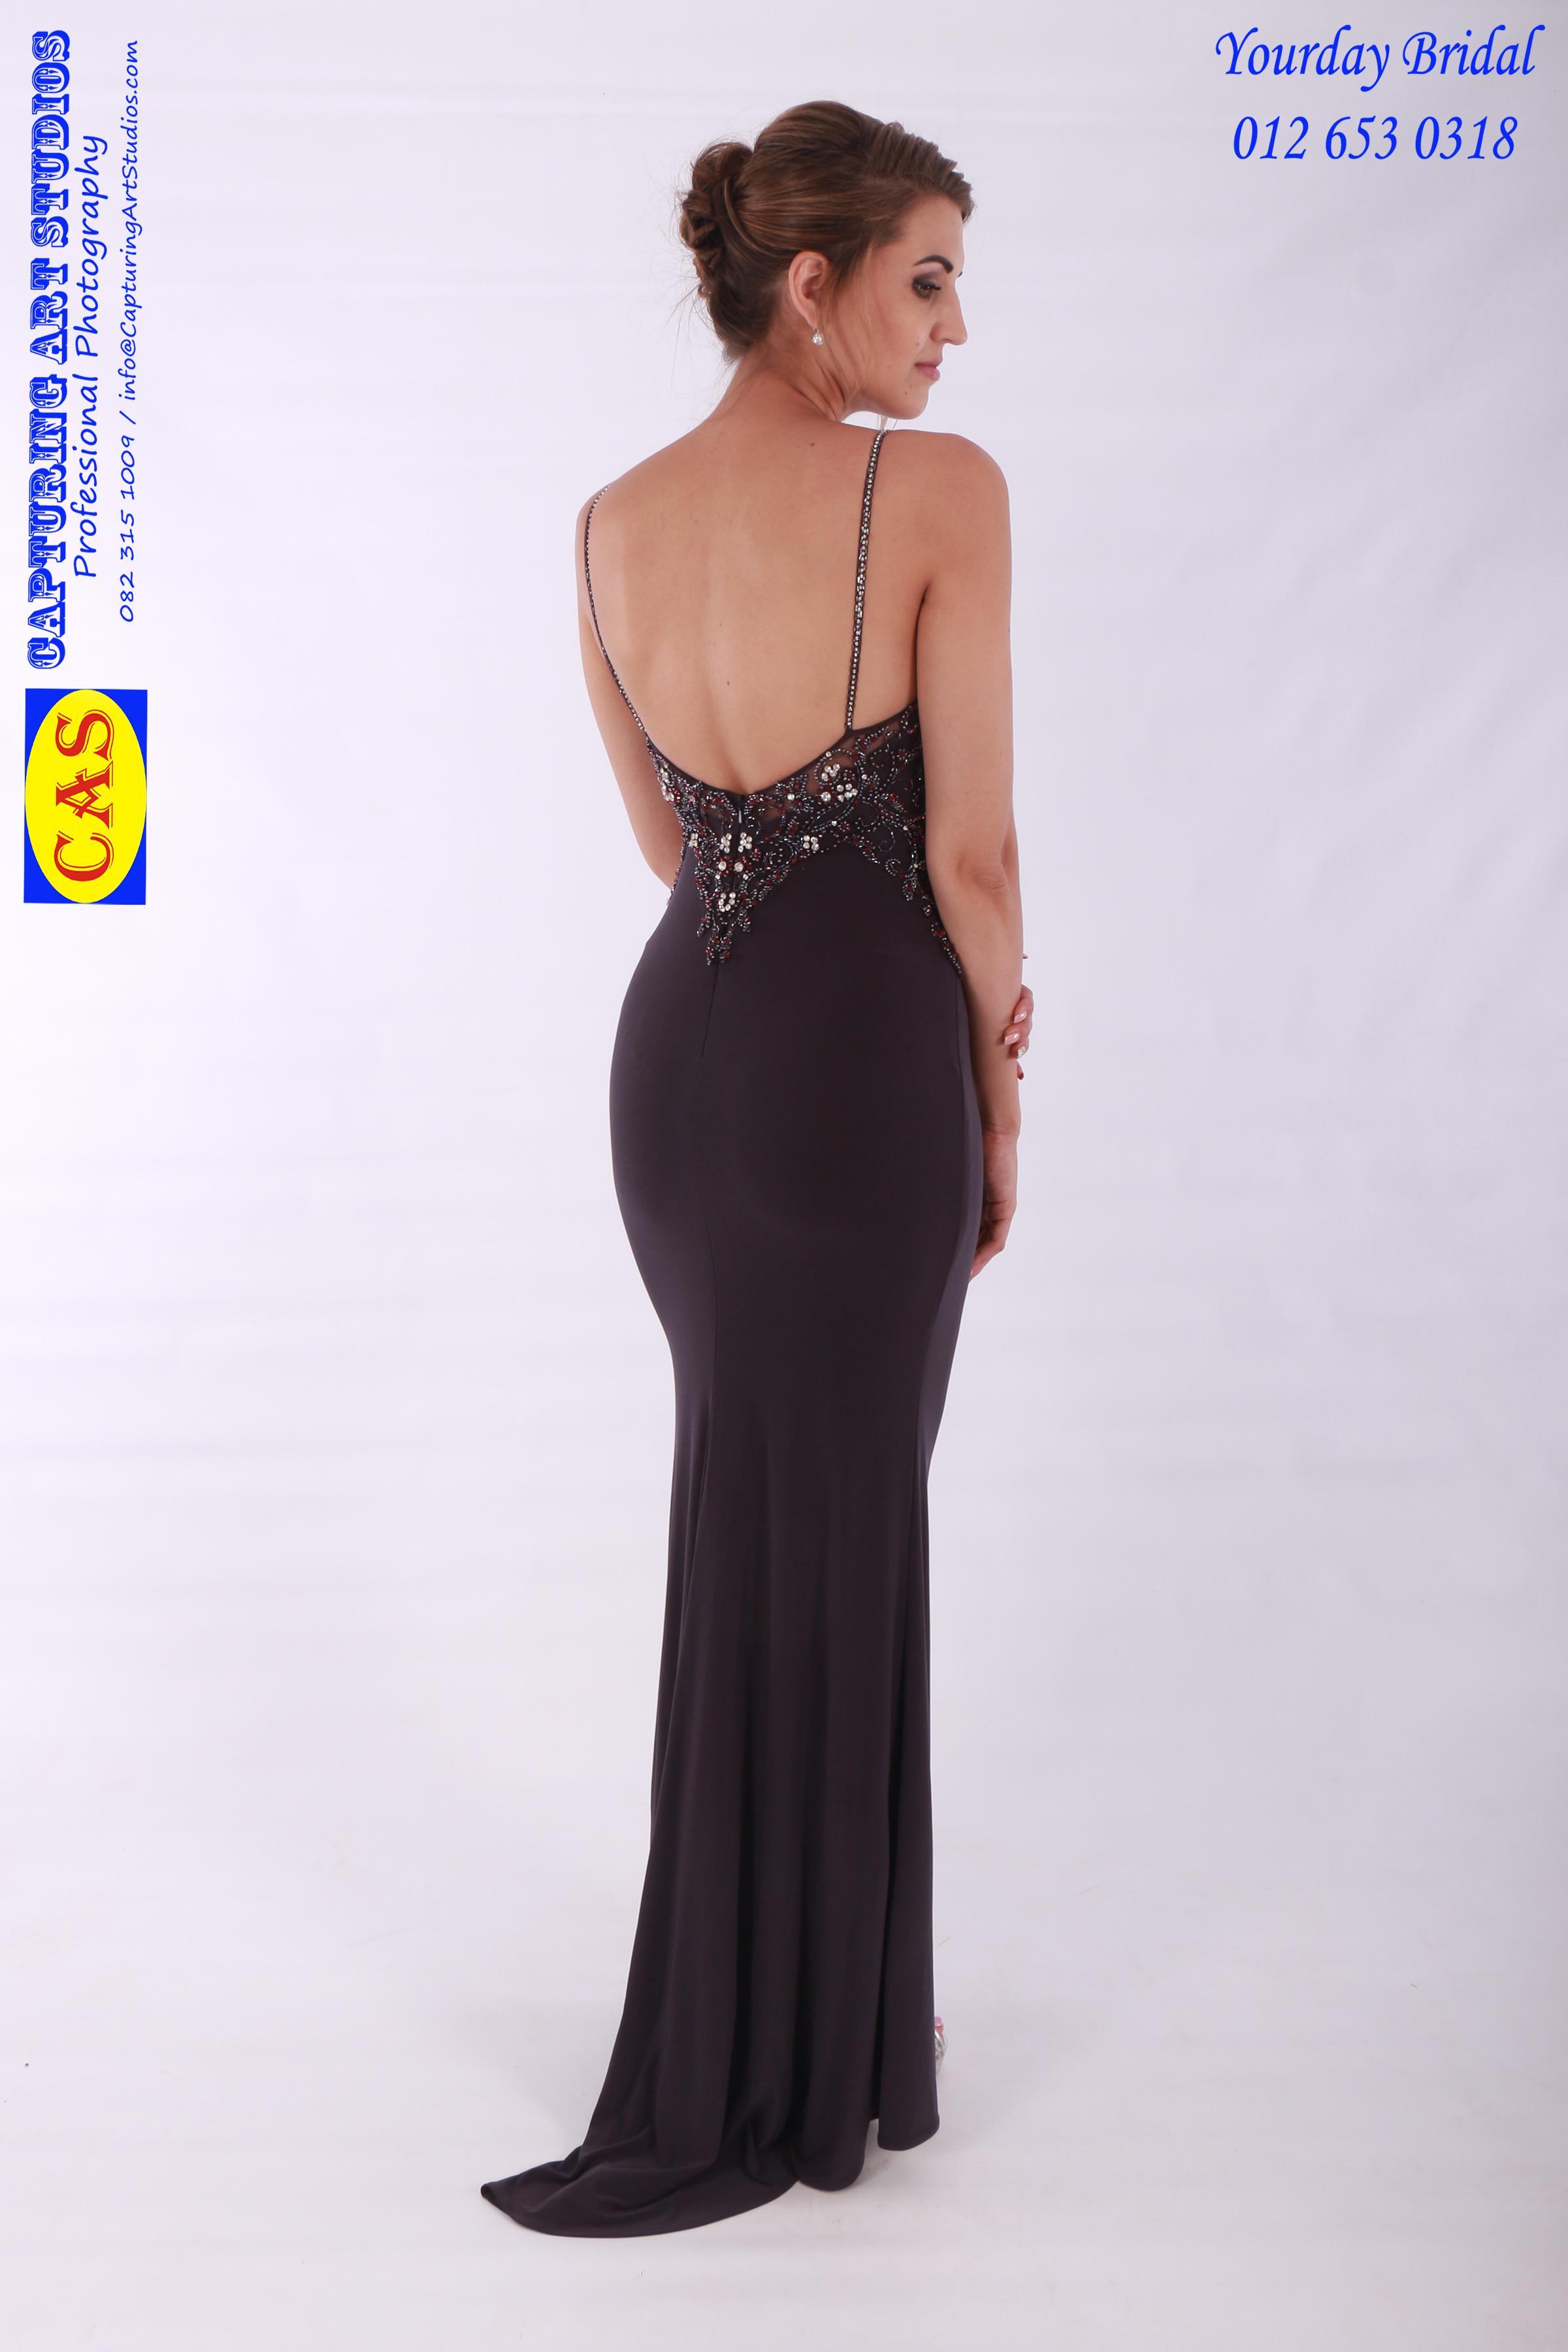 md84875-matric-farewelldance-dresses--matriekafskeidrokke-back